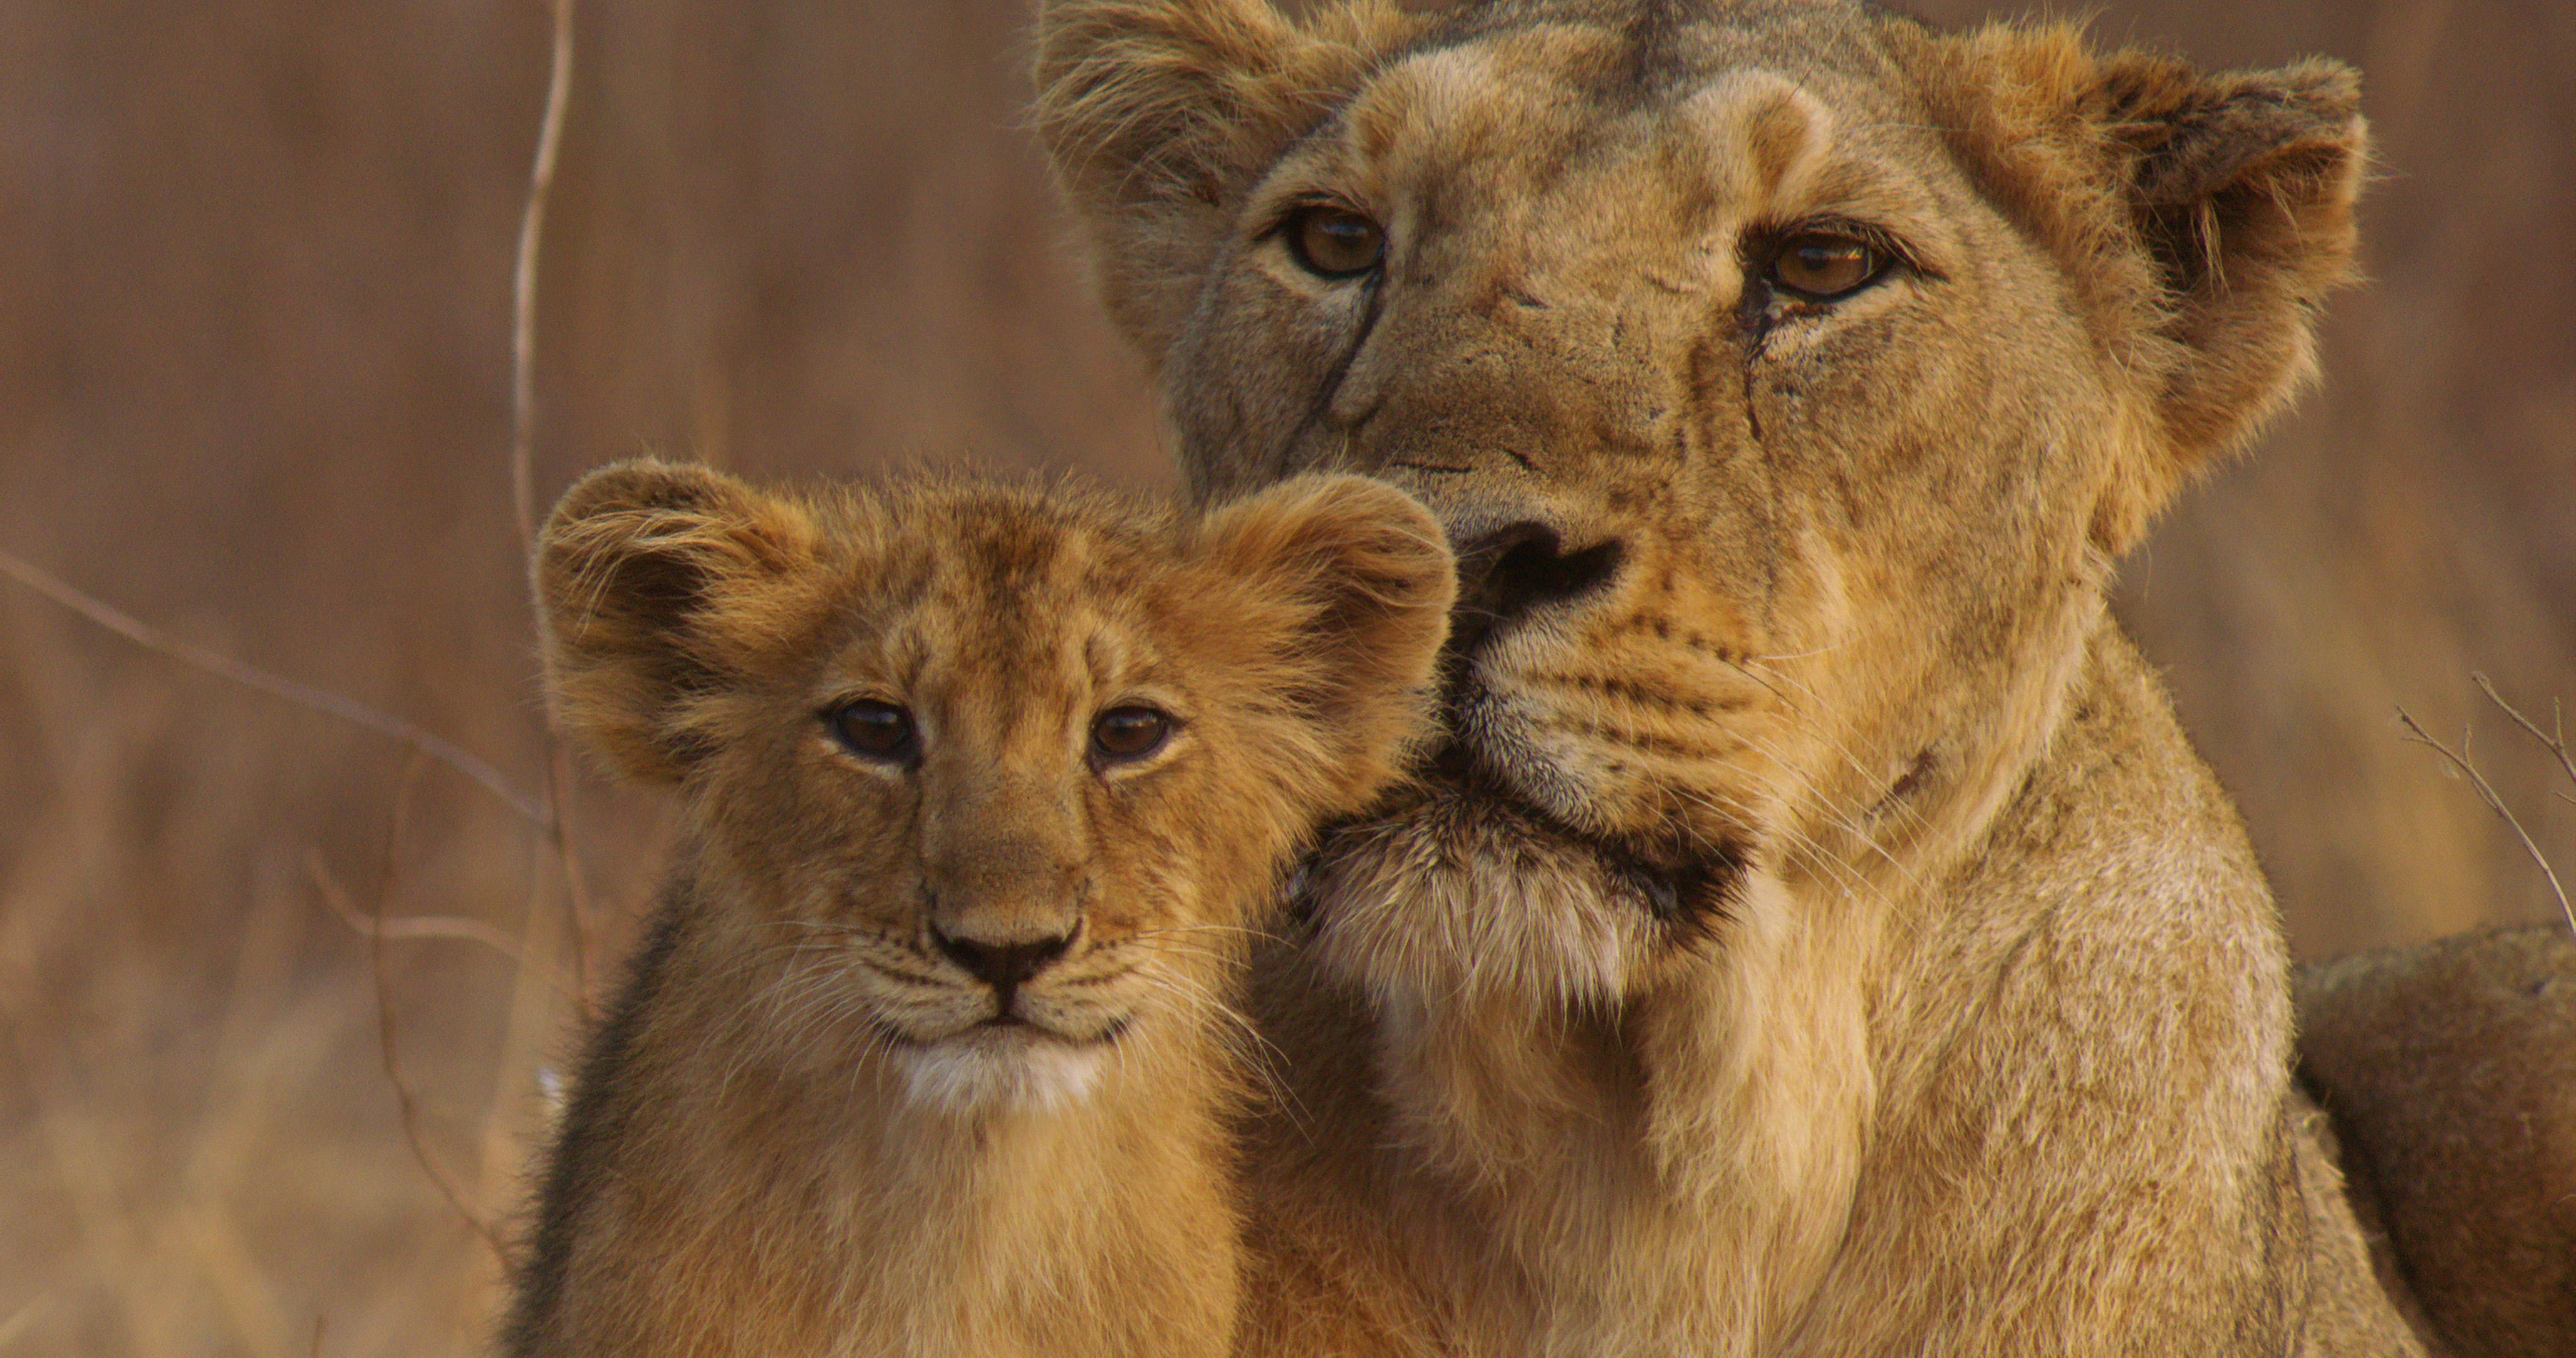 lions - photo #34